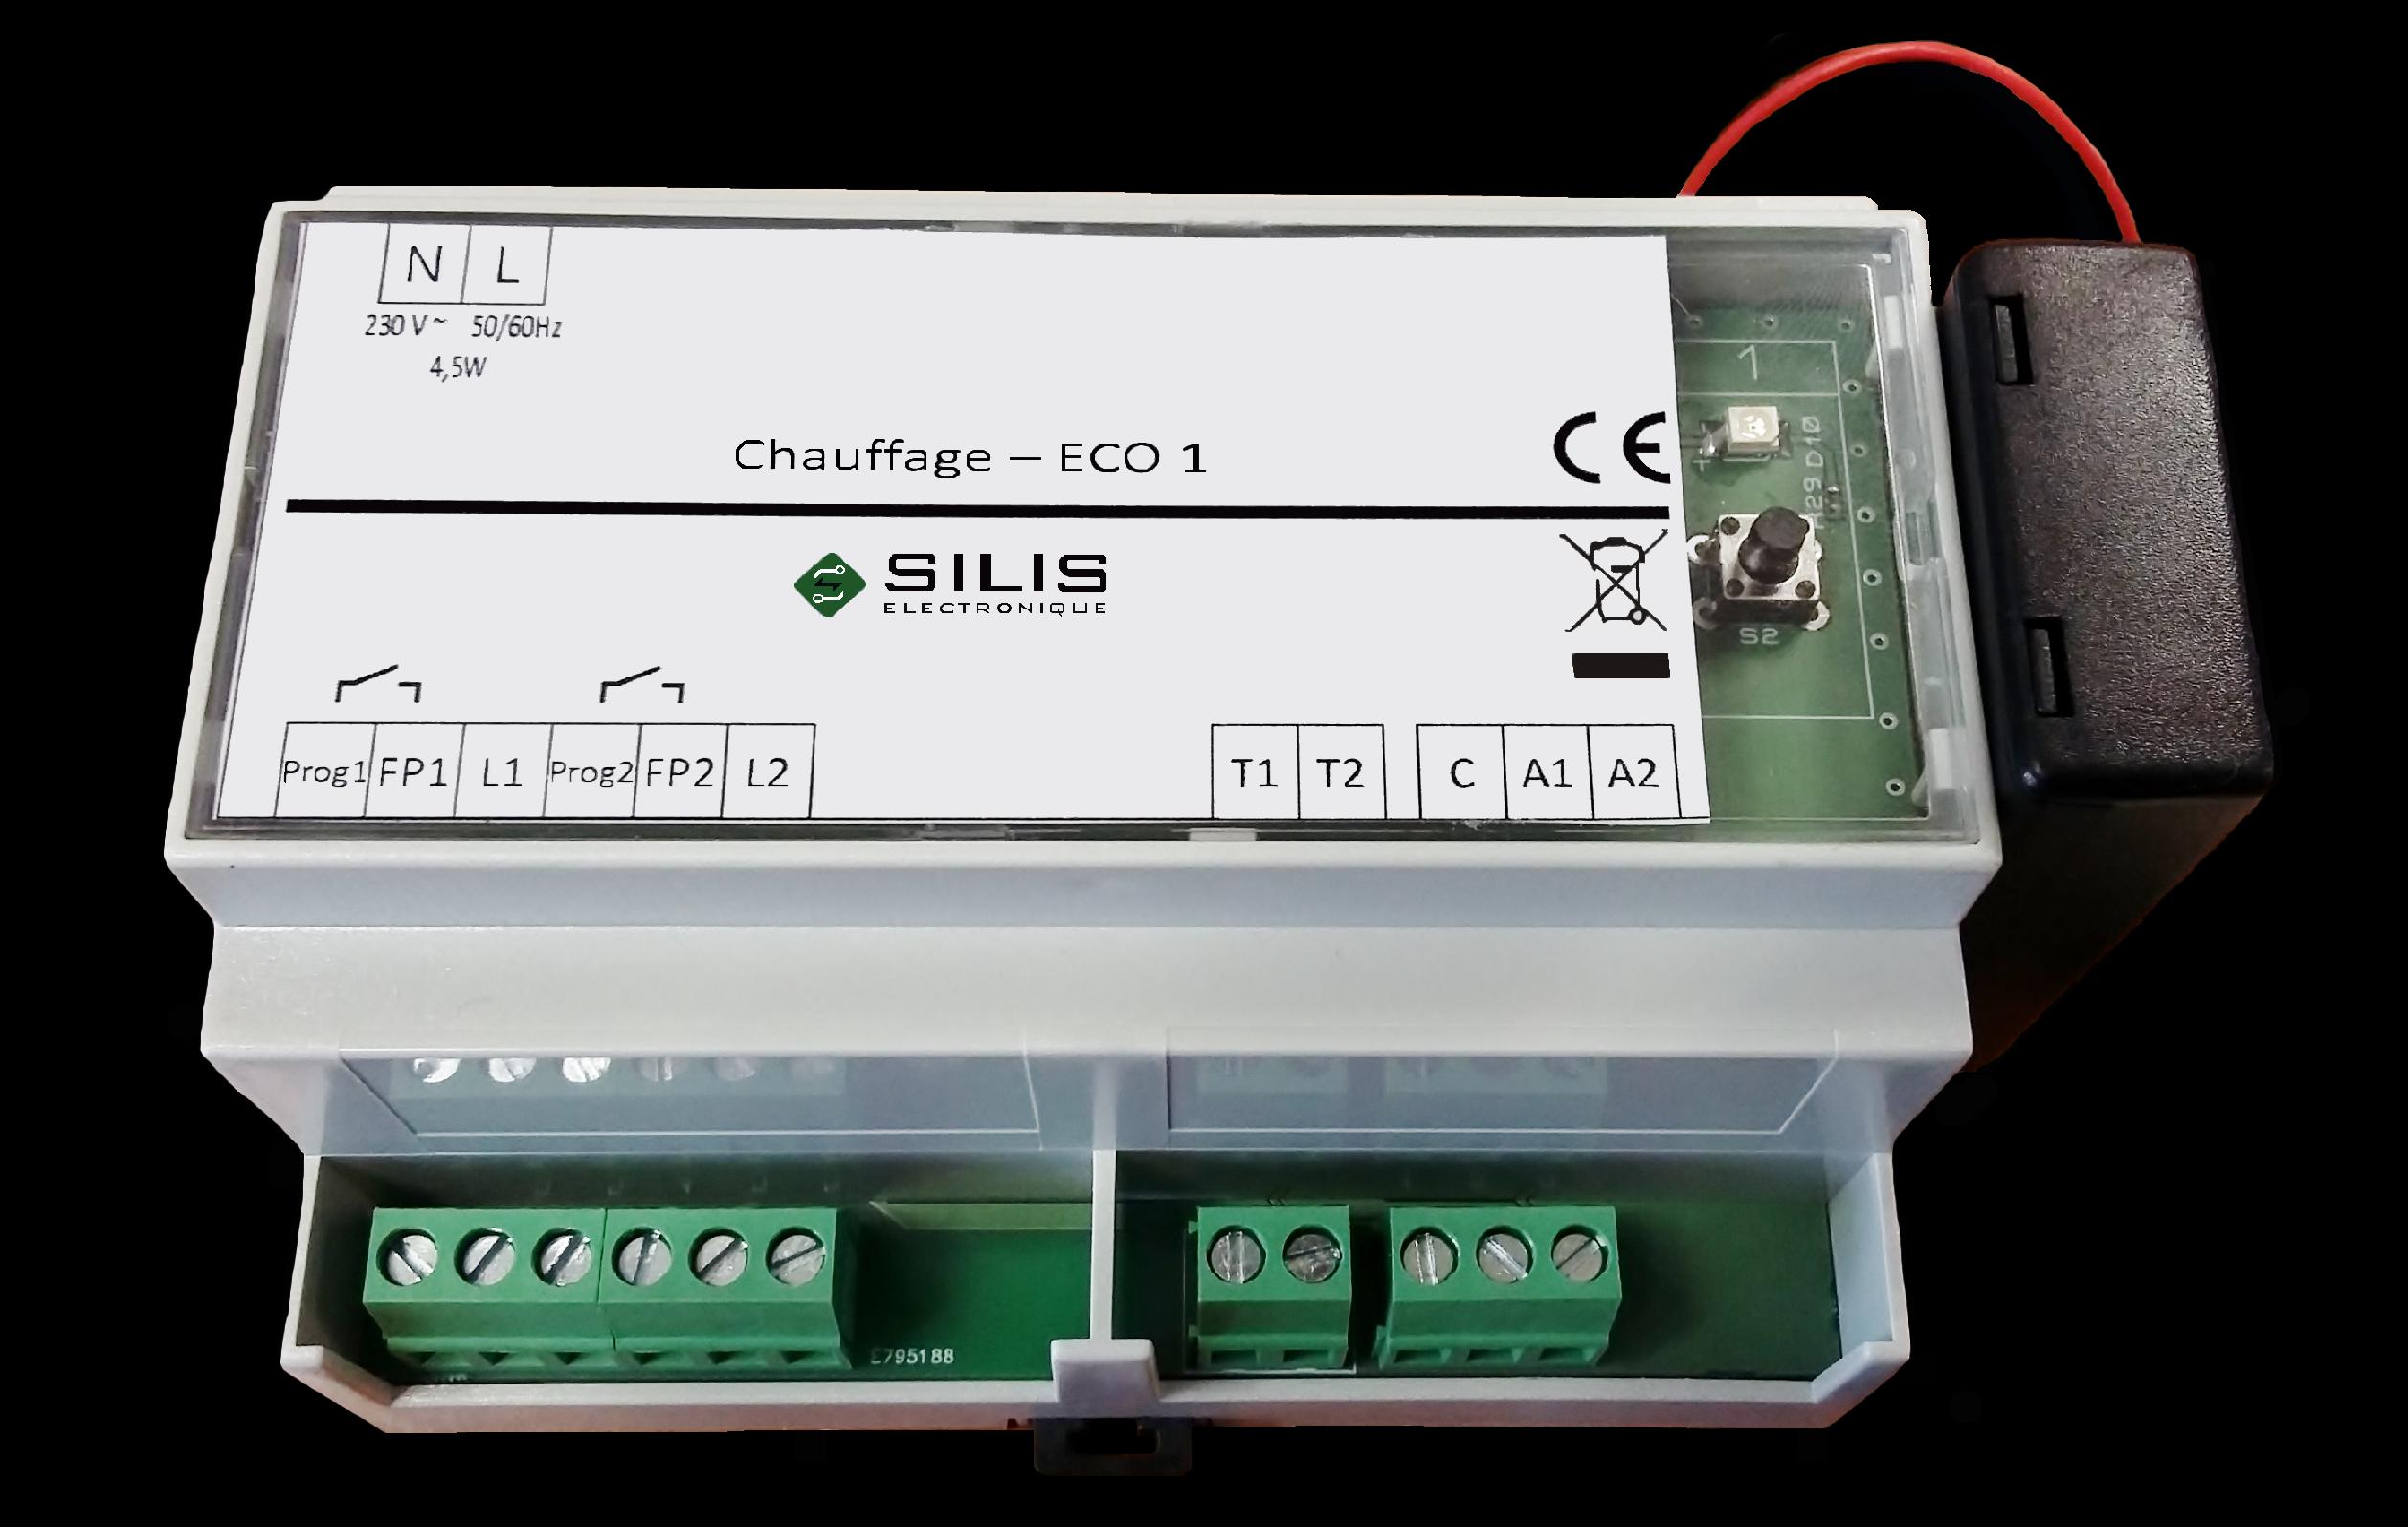 chauffage eco silis 201lectronique